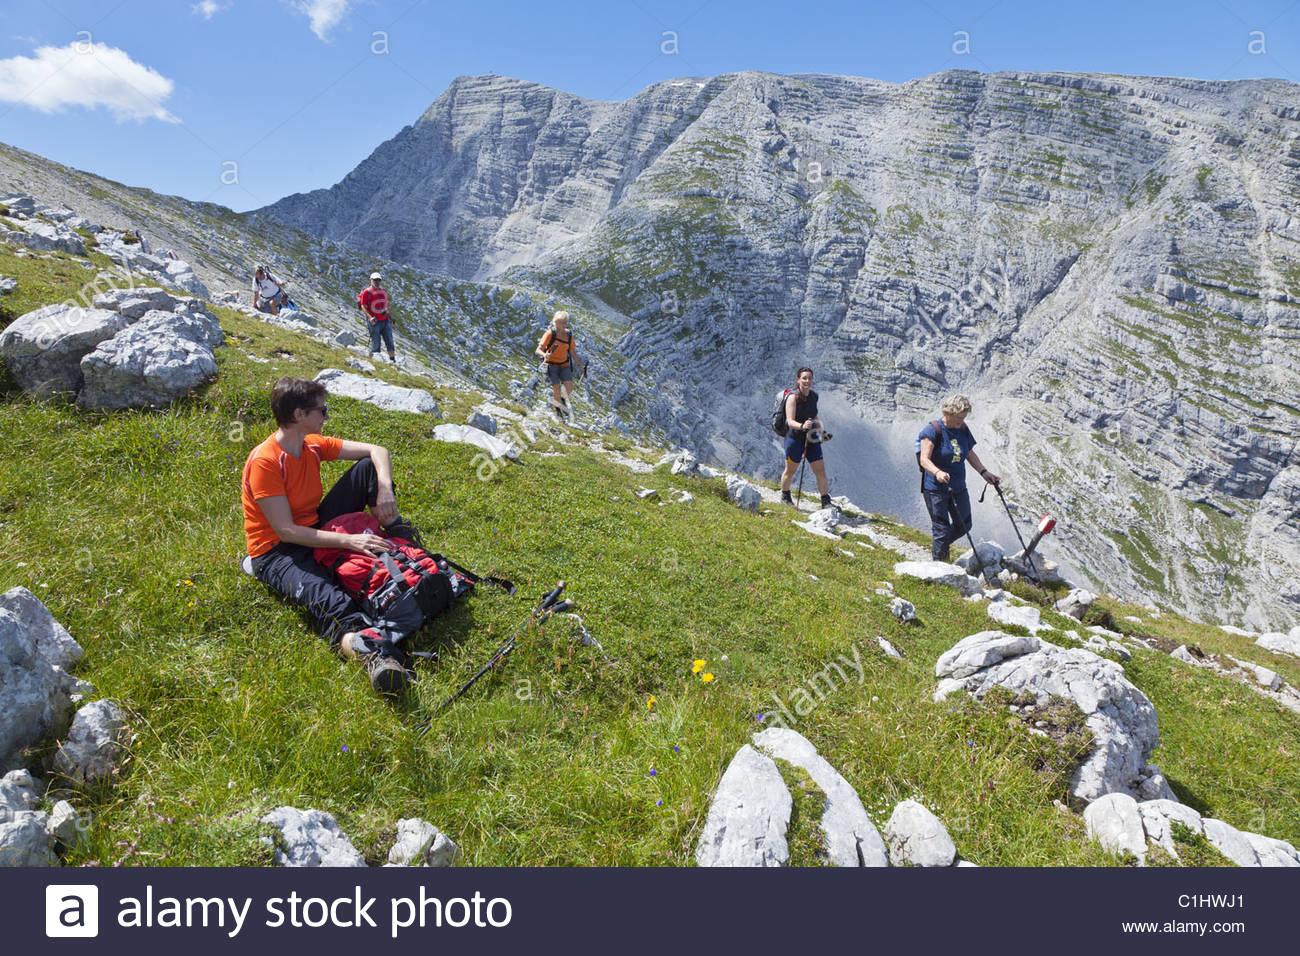 Hikers at Speikwiese, Warscheneck, Totes Gebirge, Bavaria, Germany, Europe Stock Photo